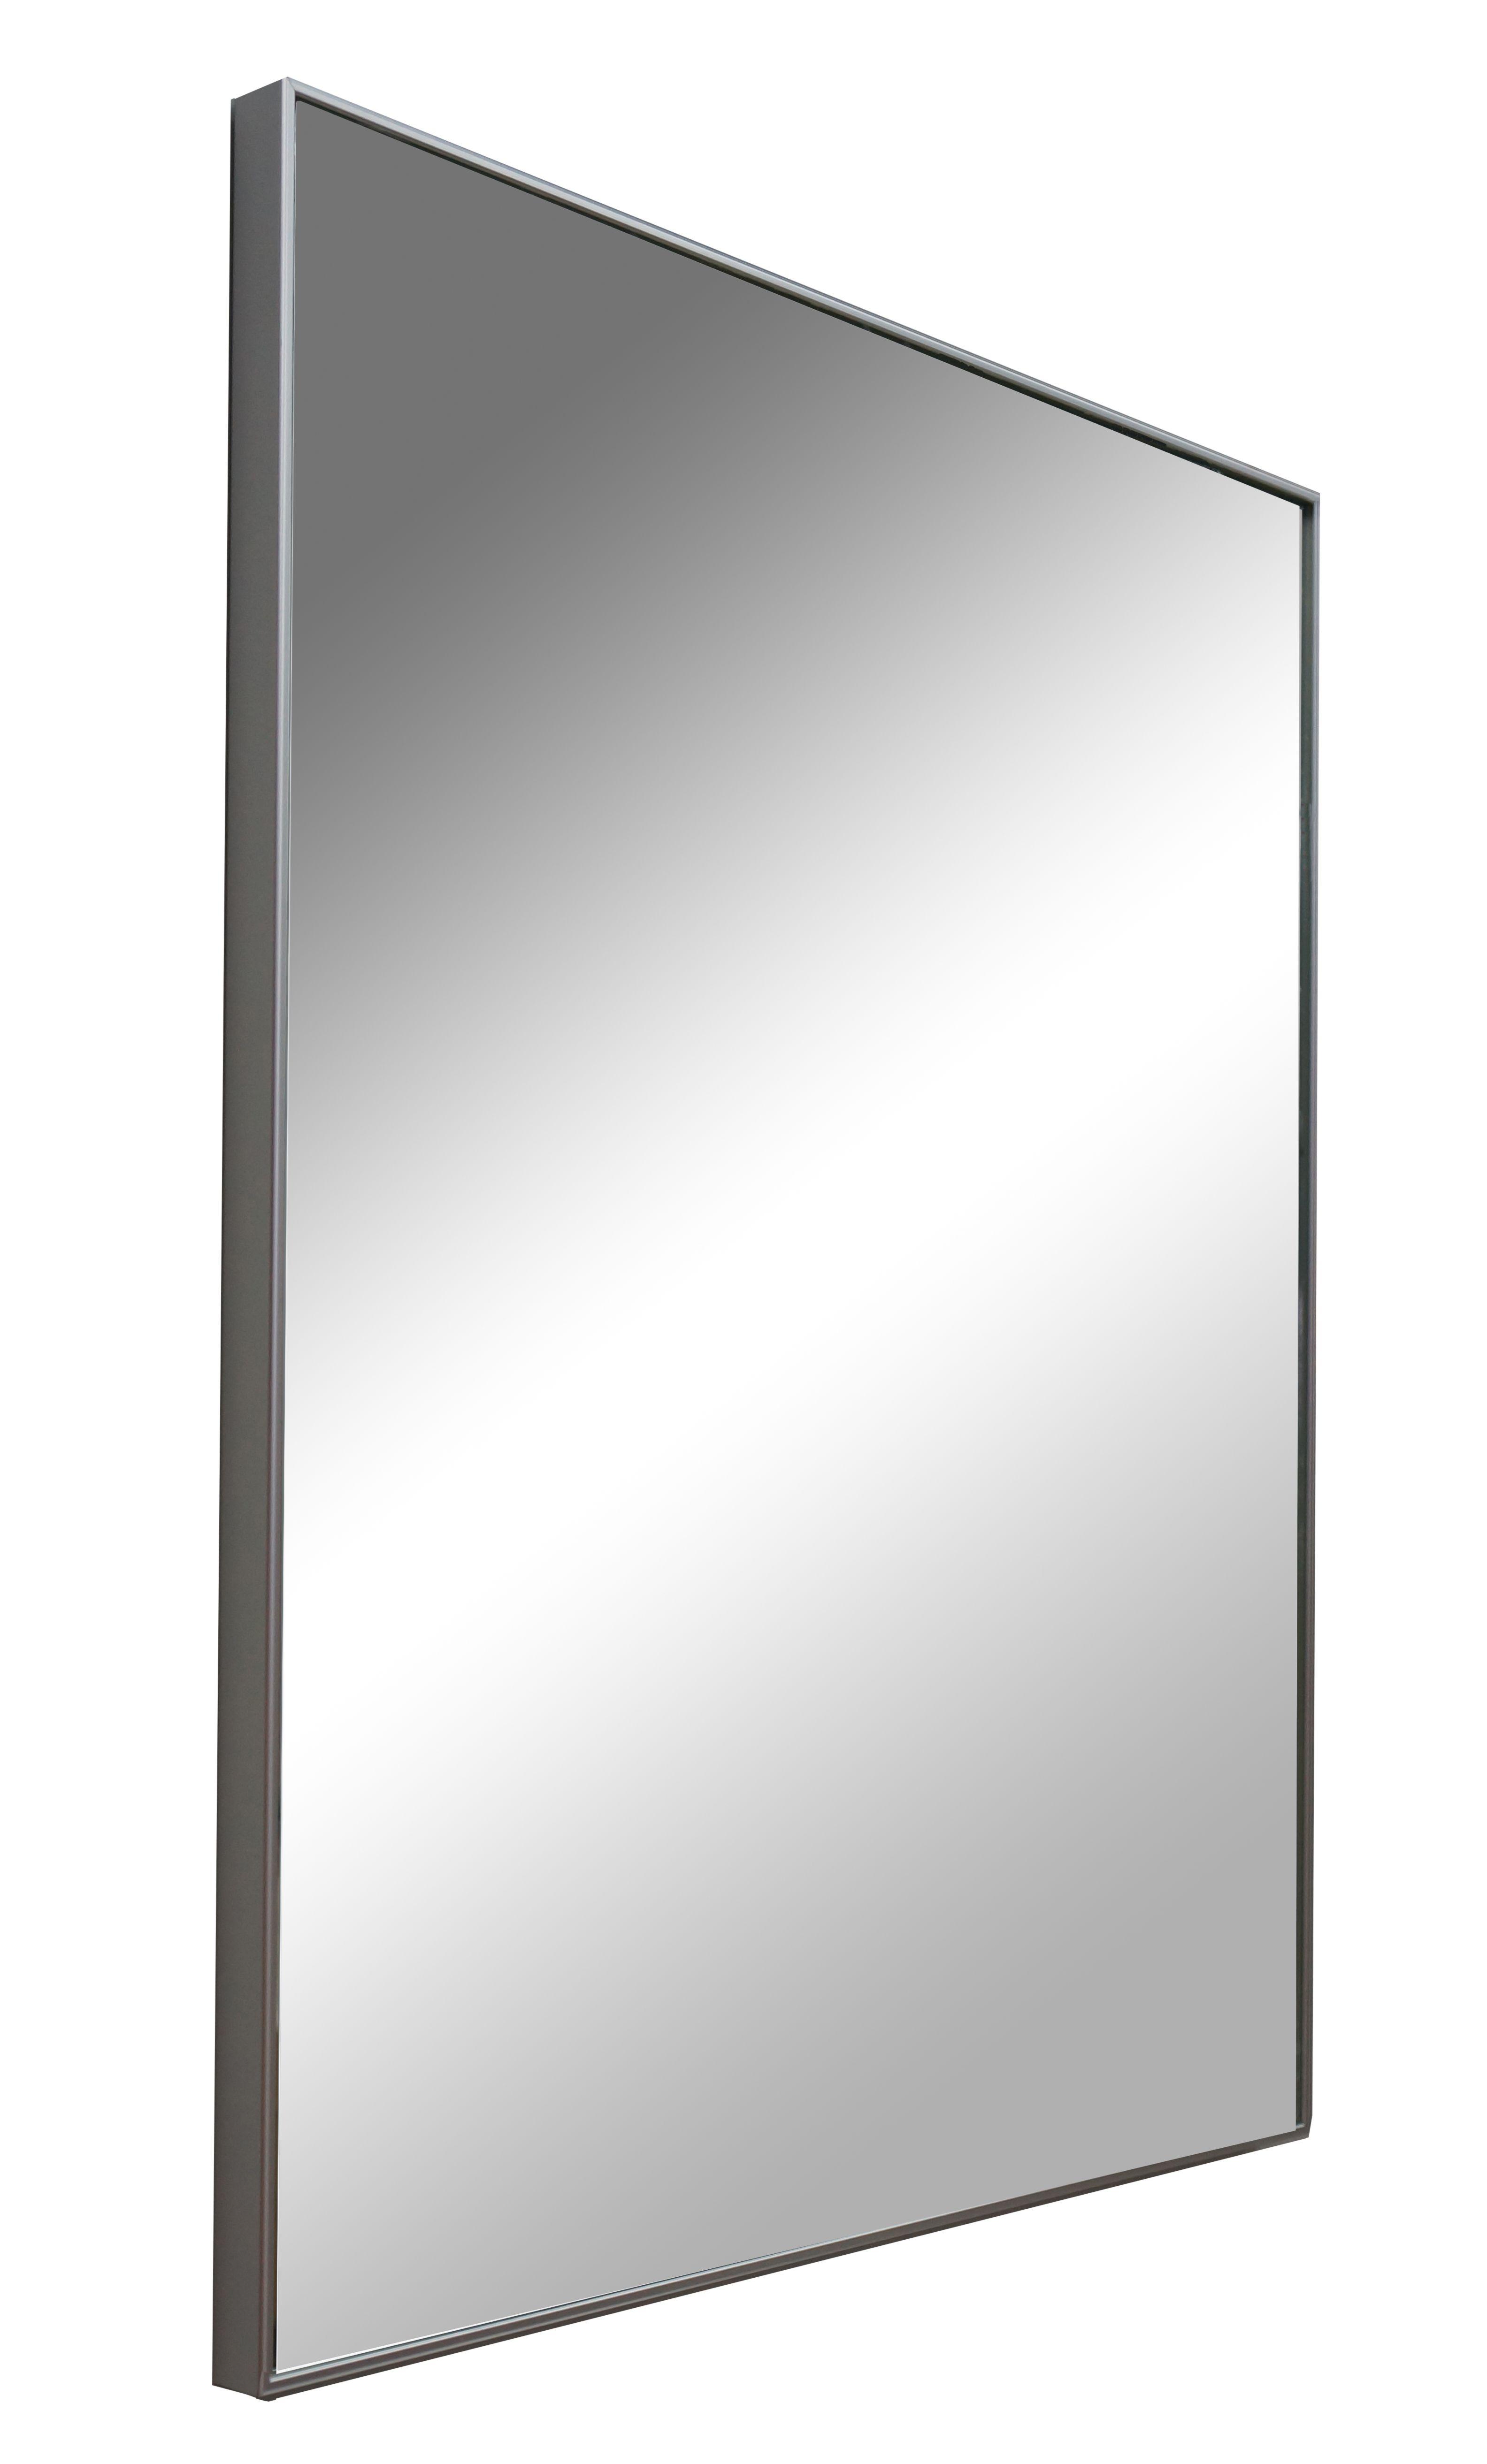 Mueller Emma spiegel met aluminium frame 50x60x2,1cm